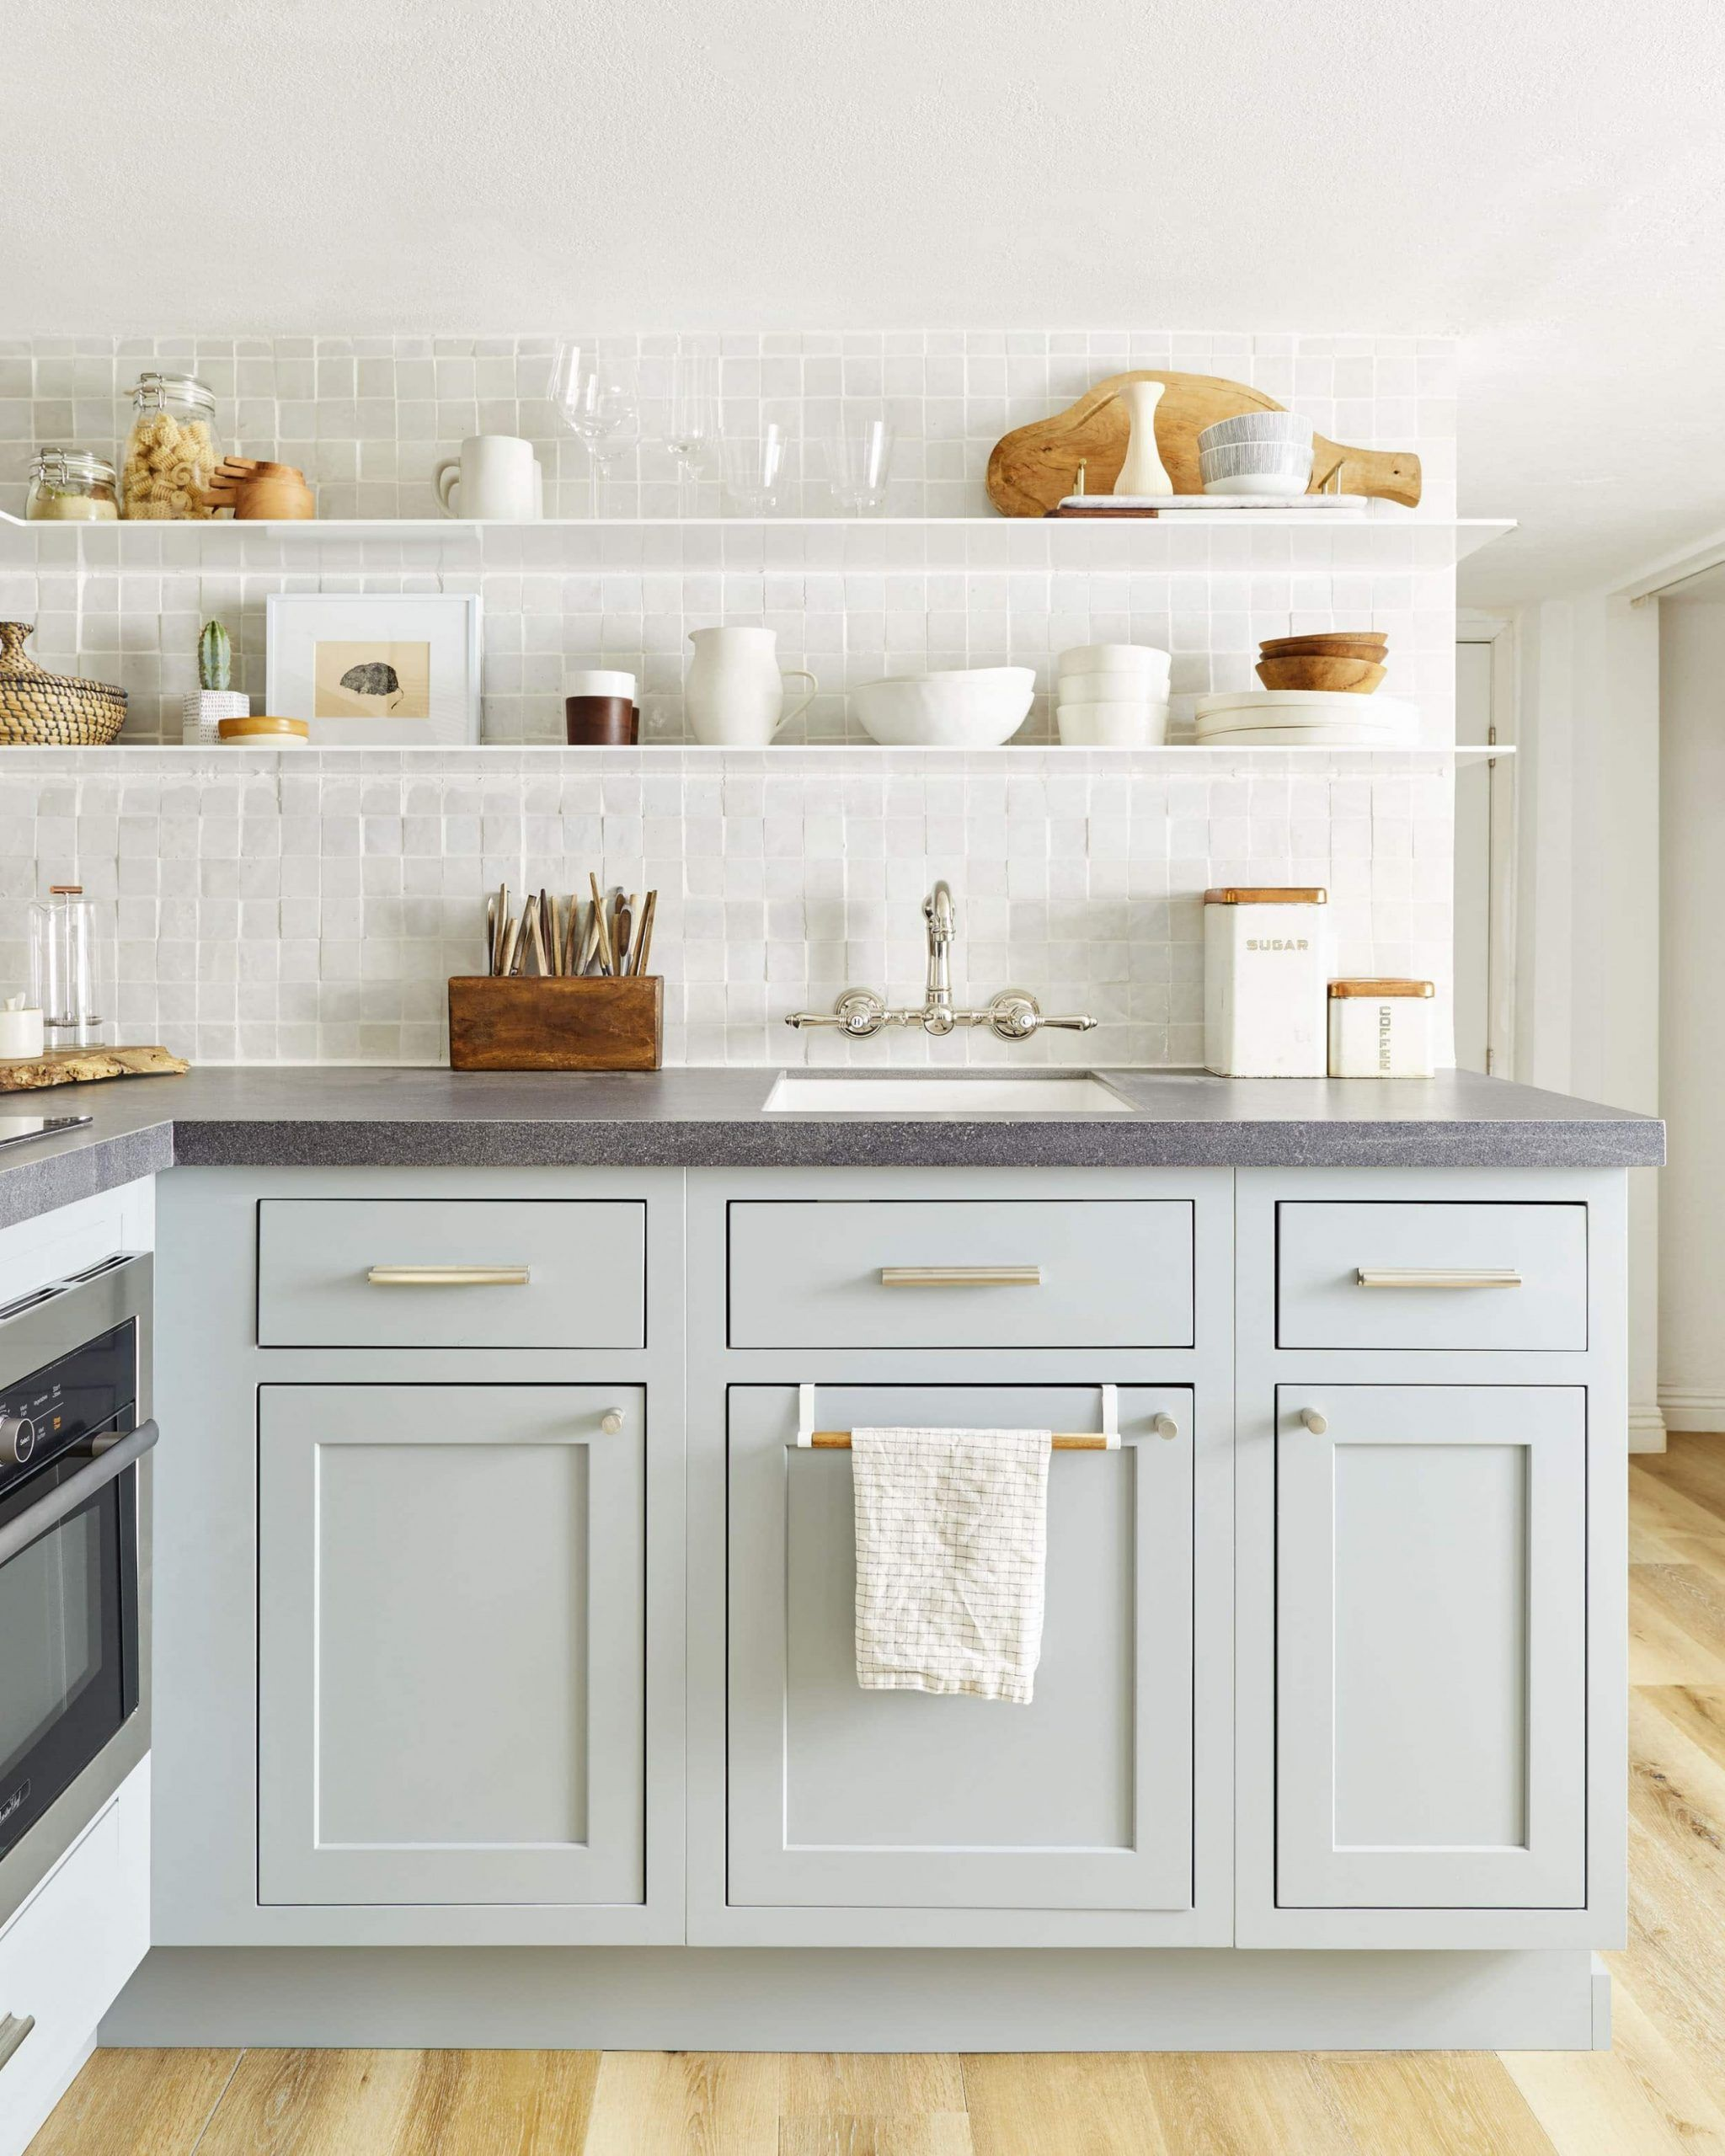 Best Place To Buy Kitchen Cabinet Hardware   Dapur ...